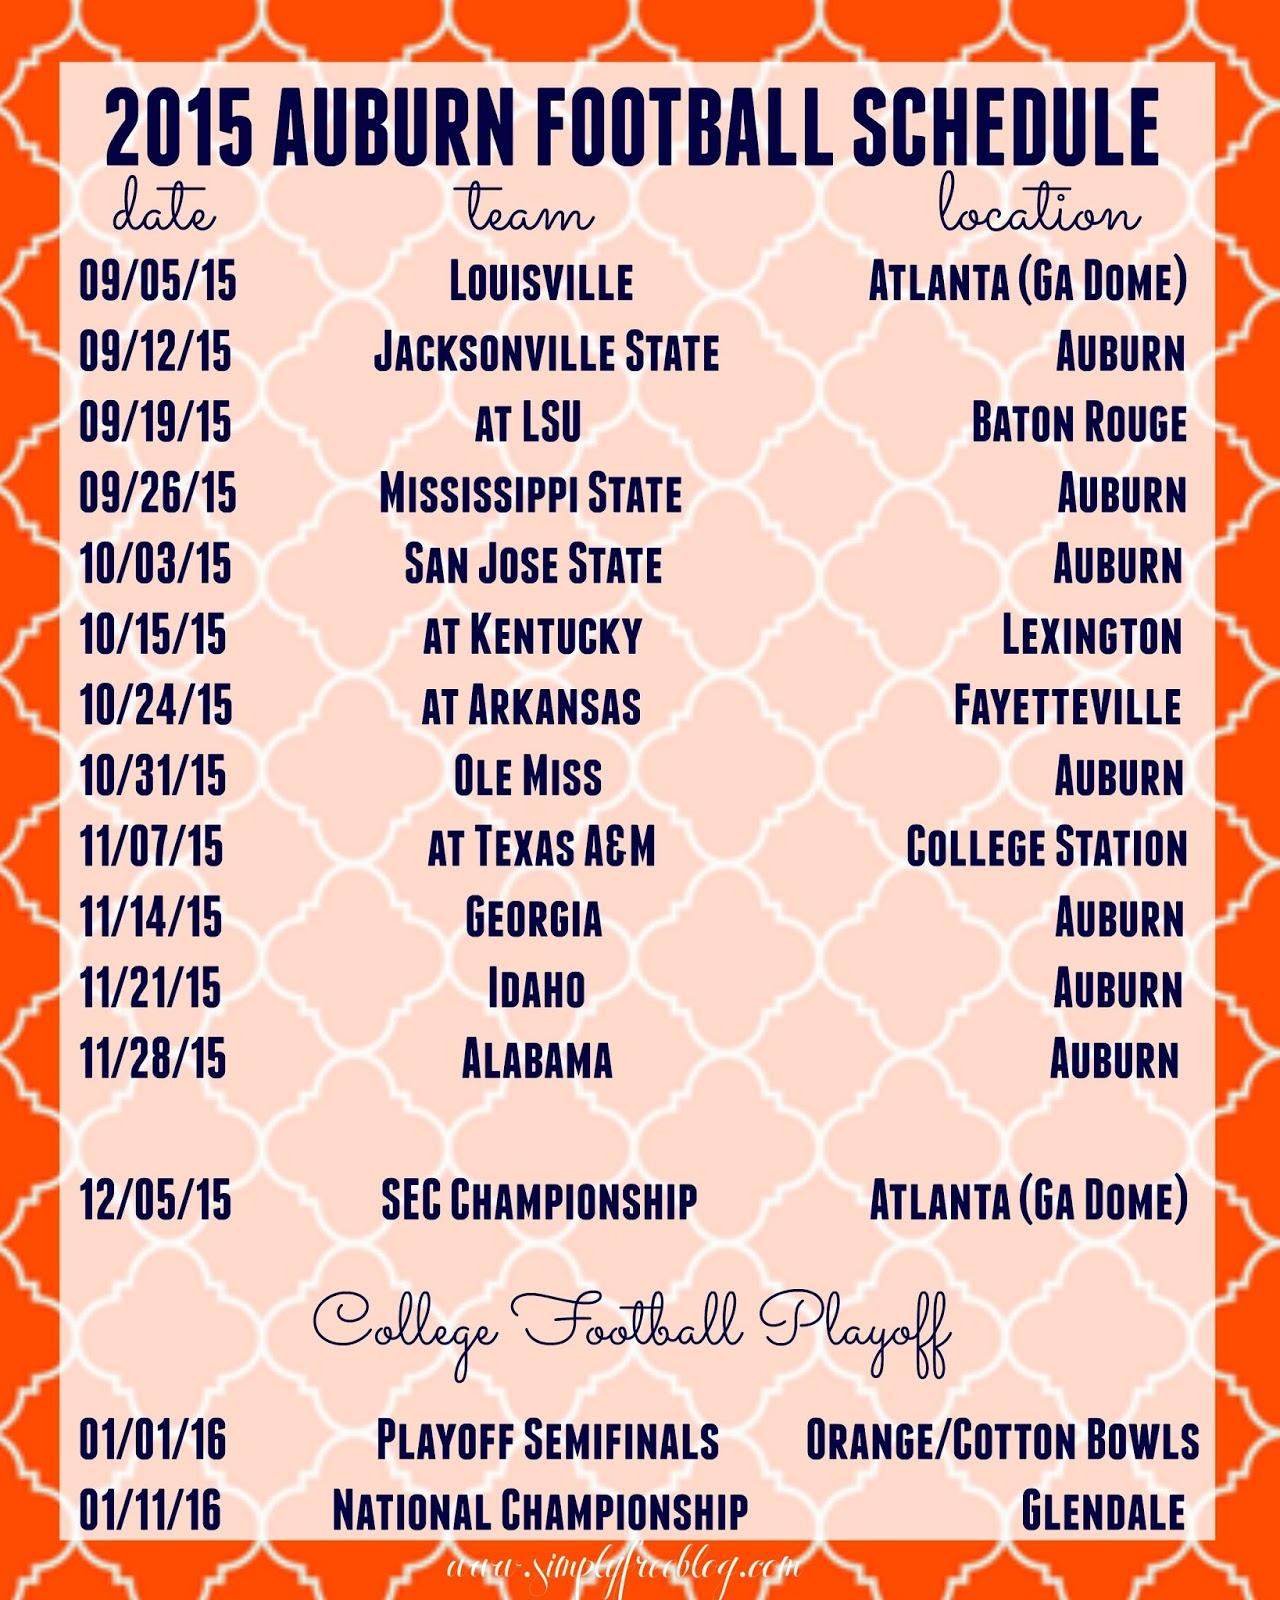 2015 Auburn Football Schedule | Freebie - Simply Elliott